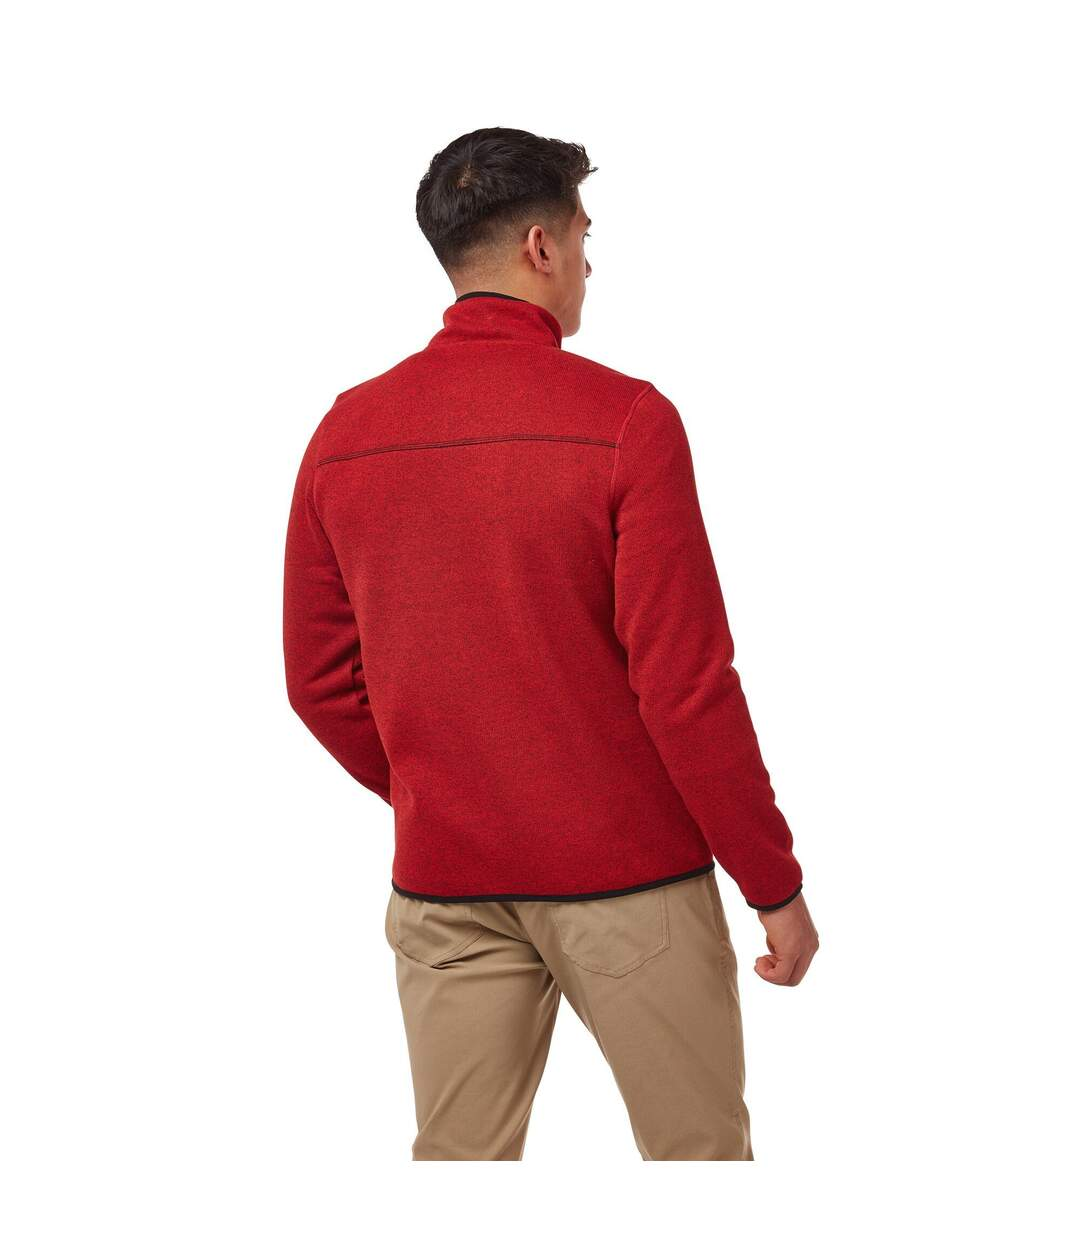 Craghoppers - Polaire ETNA - Homme (Rouge chiné) - UTCG1142